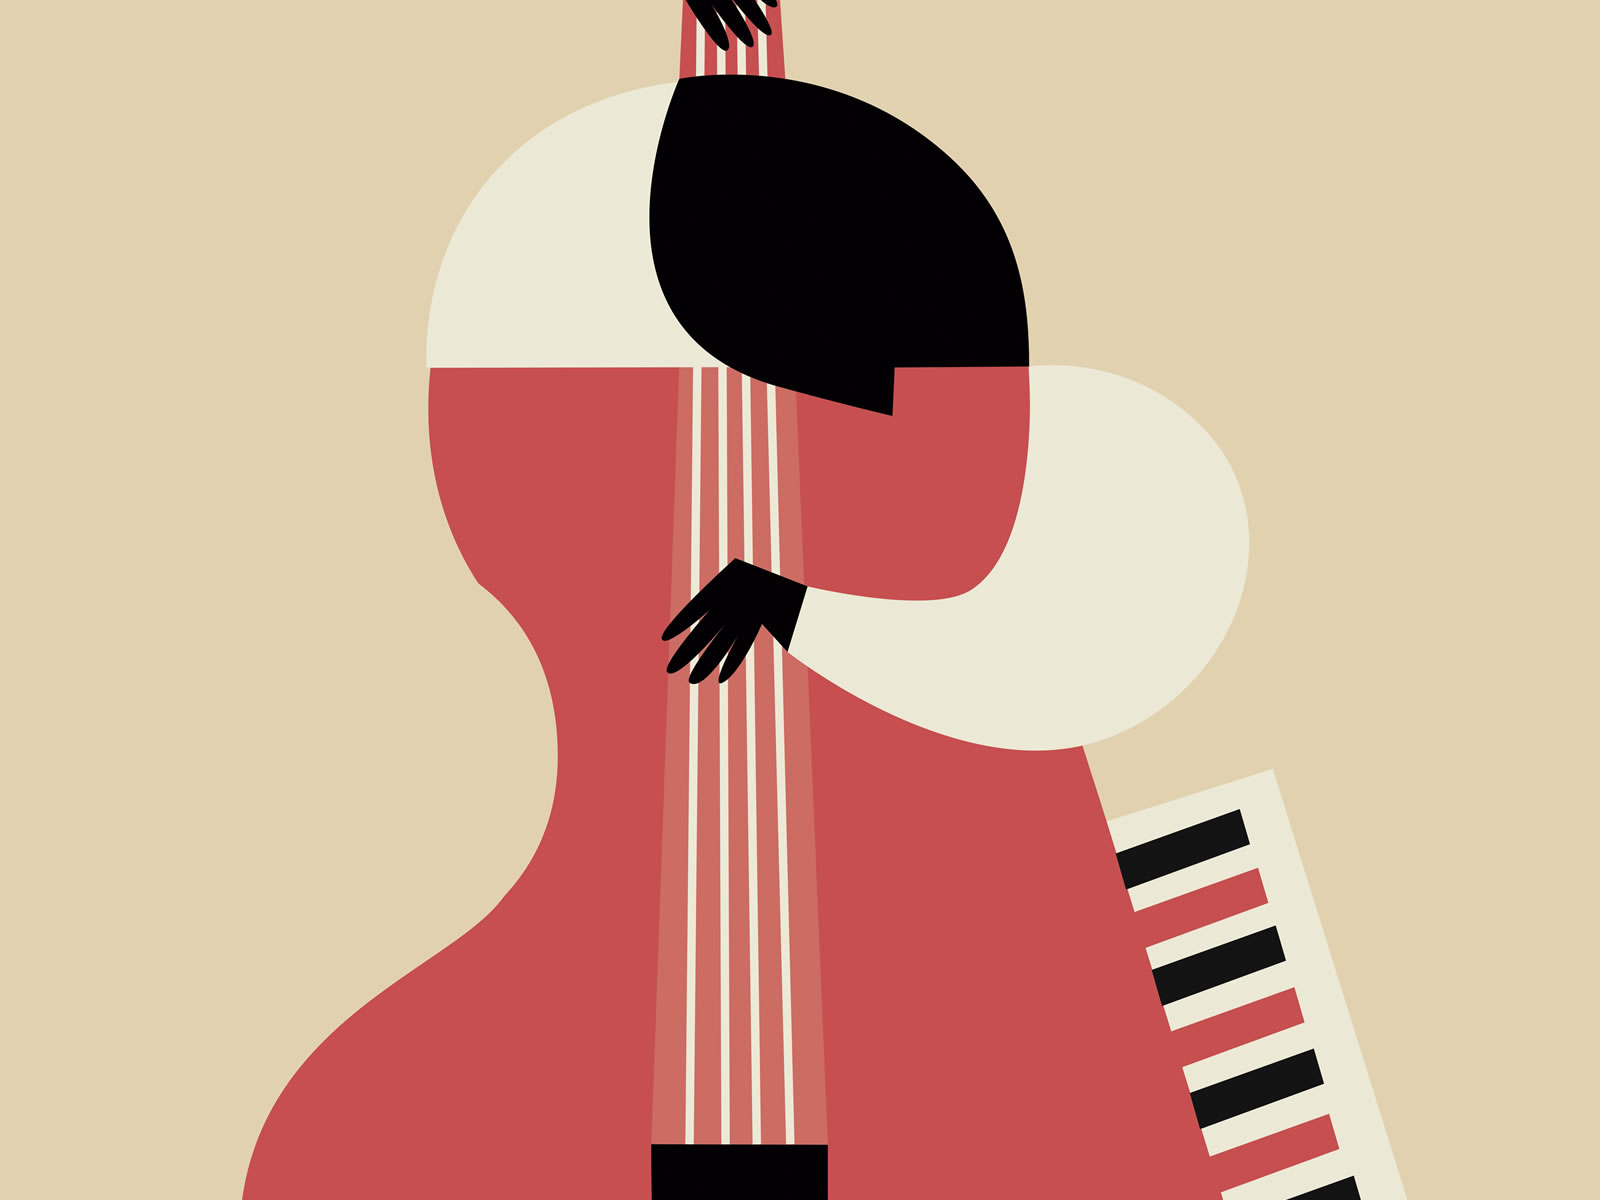 Festival de jazz Vitoria-Gasteiz 19